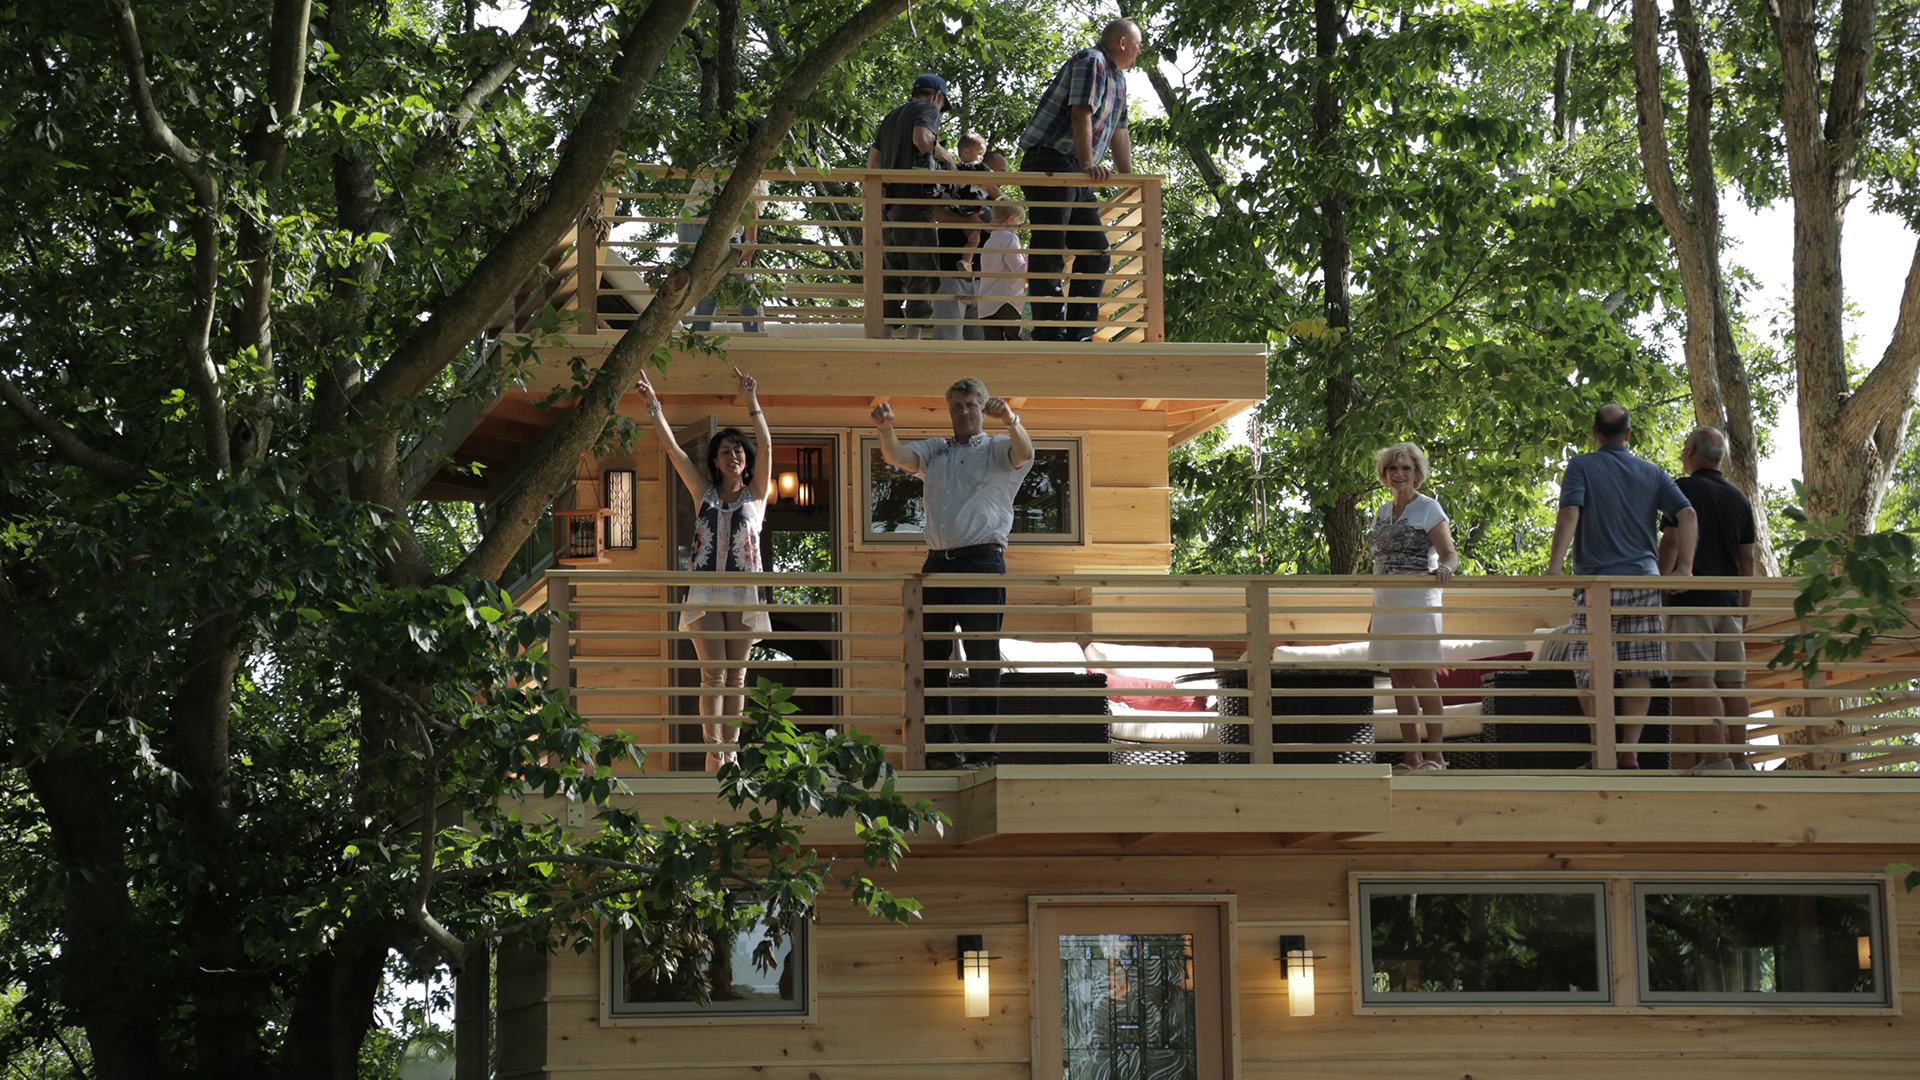 Treehouse Masters Frank Lloyd Wrightinspired treehouse